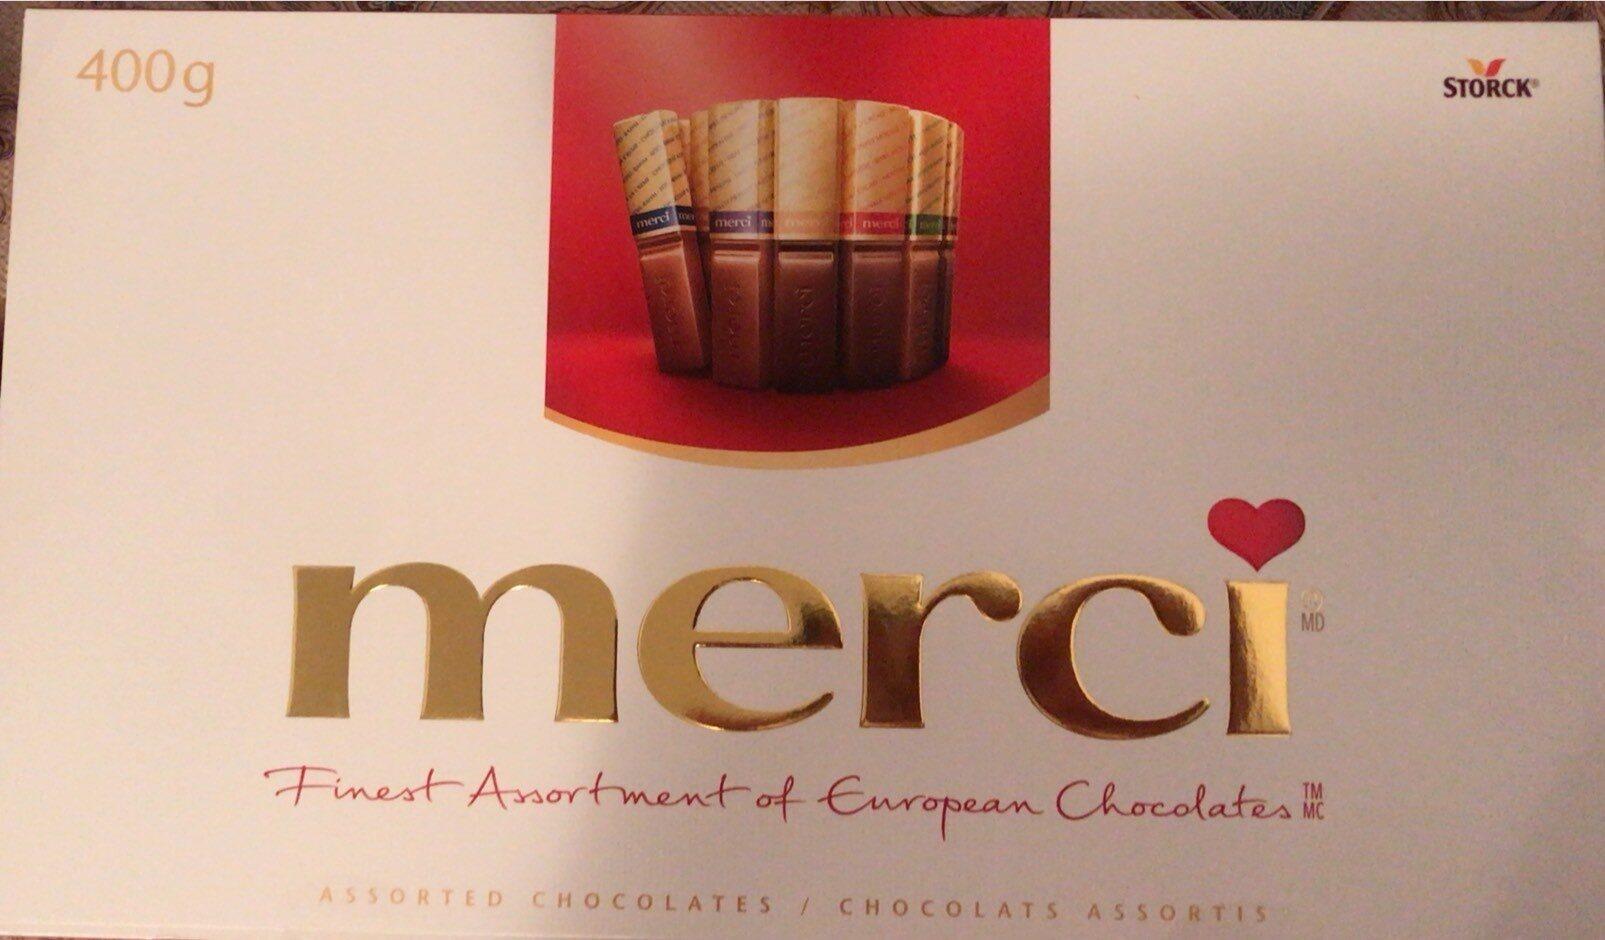 Assorted Chocolates - Product - en